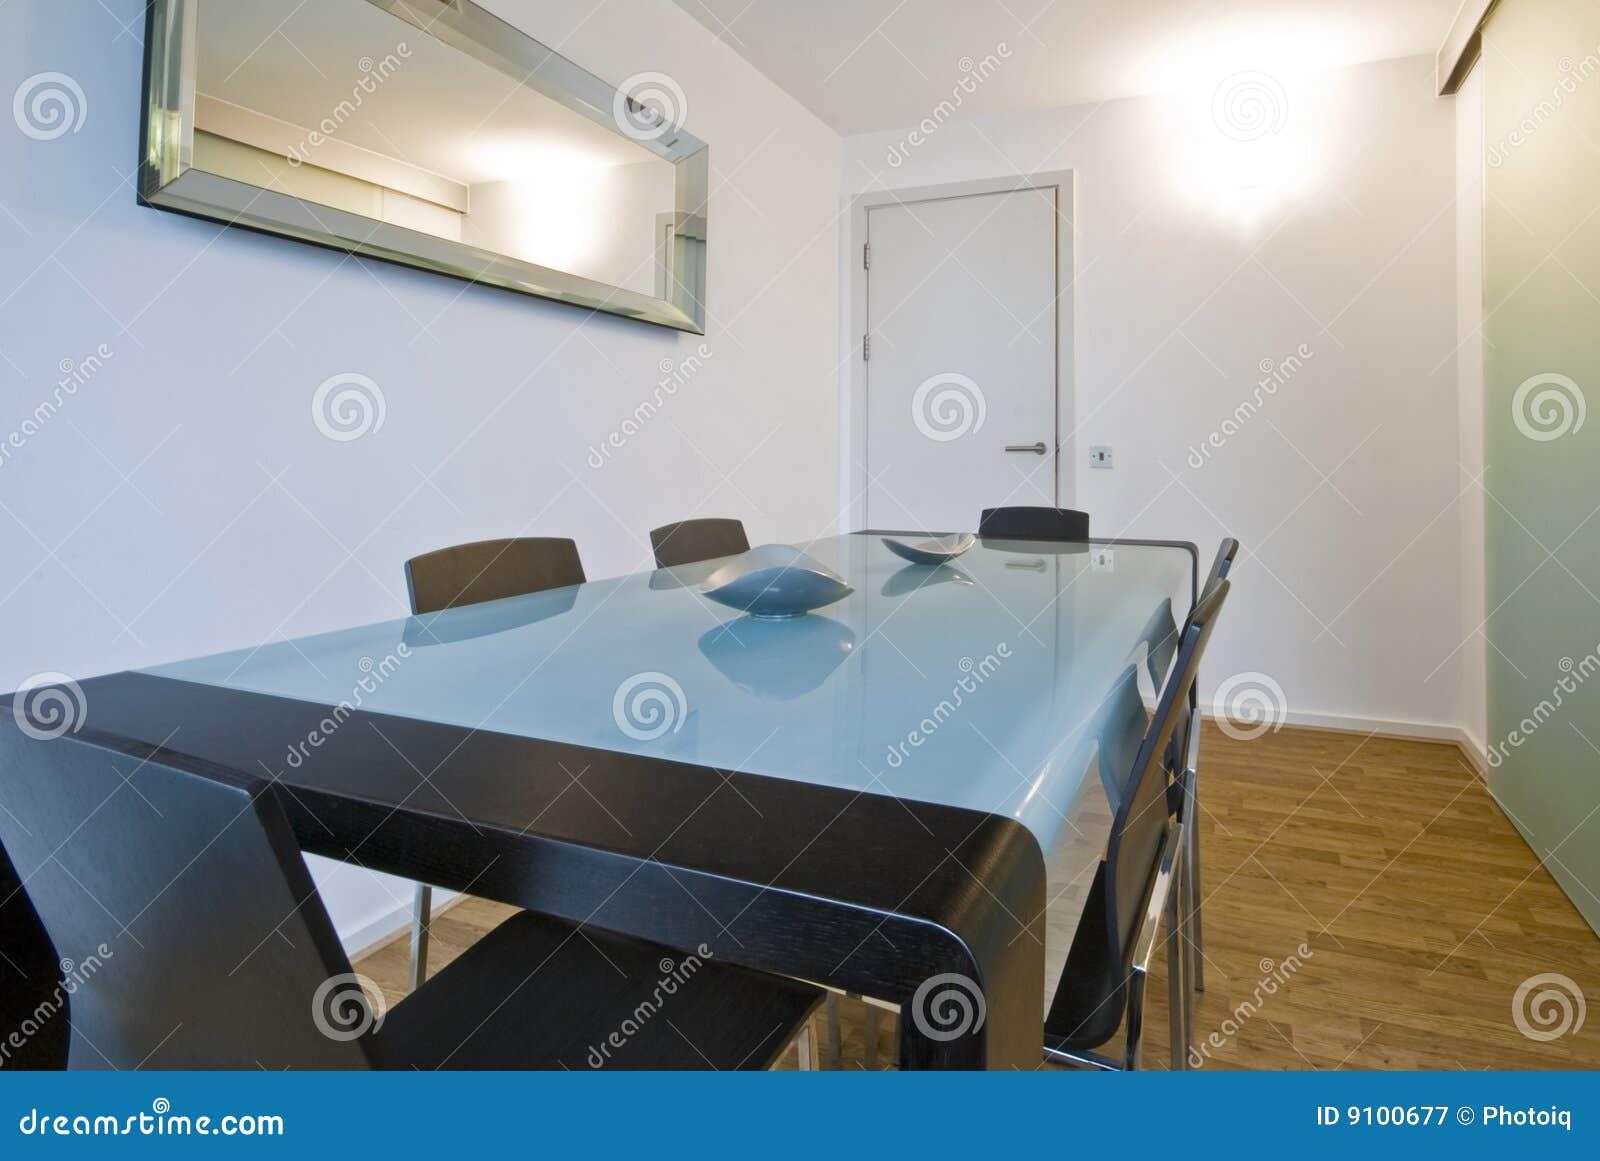 Libera Da Diritti: Sala Da Pranzo Con Mobilia Minimalistic Moderna #836536 1300 960 Sala Da Pranzo Conforama